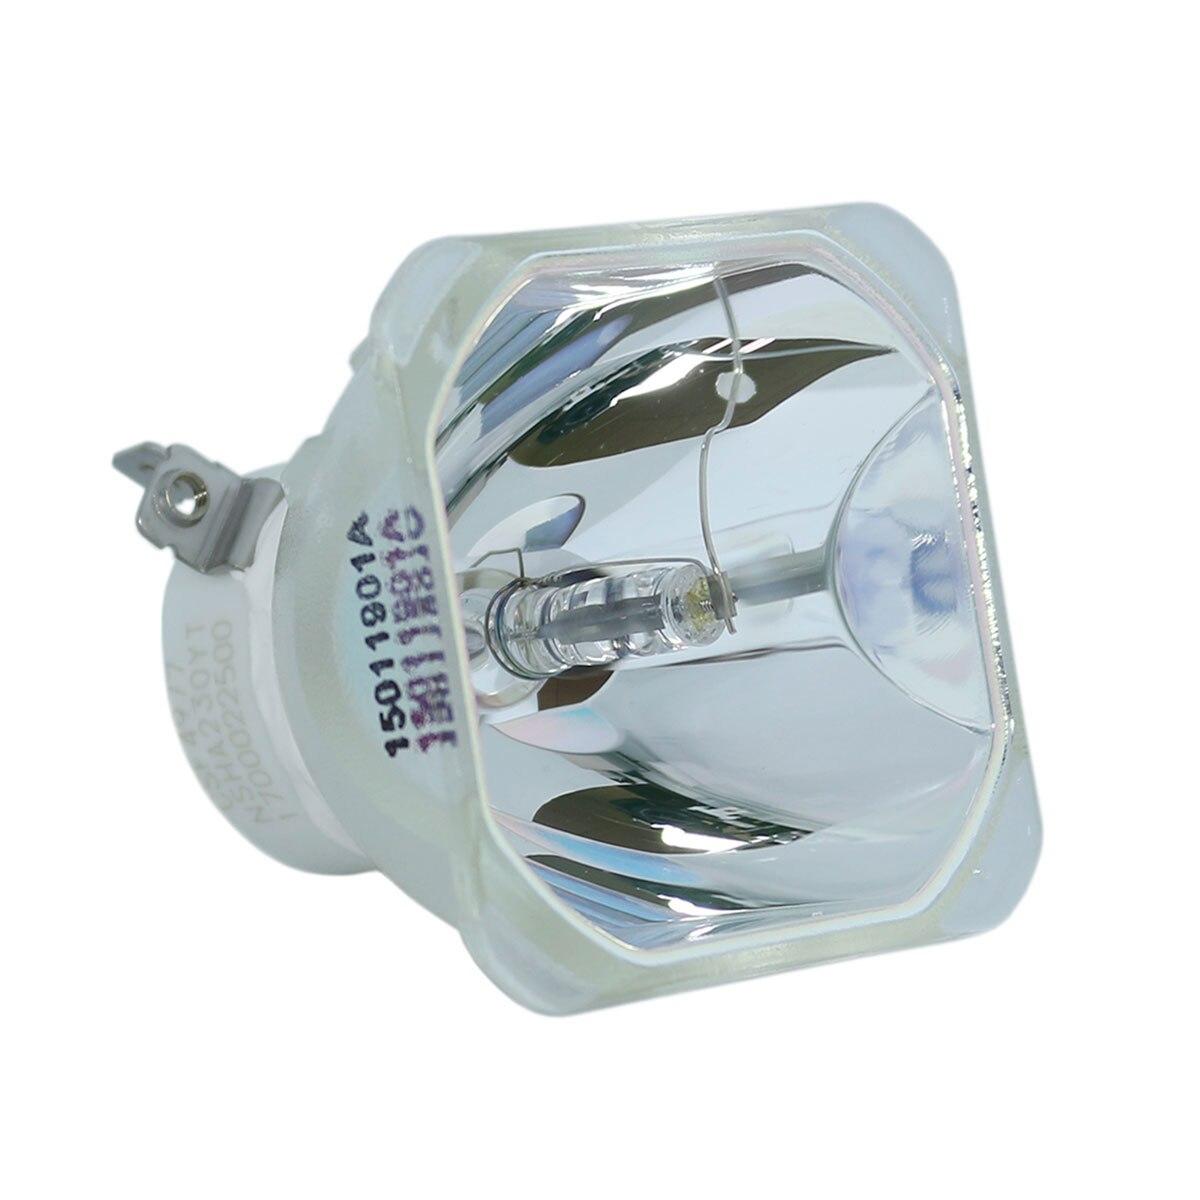 ET-LAV300 for Panasonic PT-VX42Z PT-VW345NZ PT-W355N PT-VX420 PTVX425 PT-VW350 PT-VW340Z PT-VX415N PT-VX410Z Projector Lamp Bulb vestel vdd 345 vw